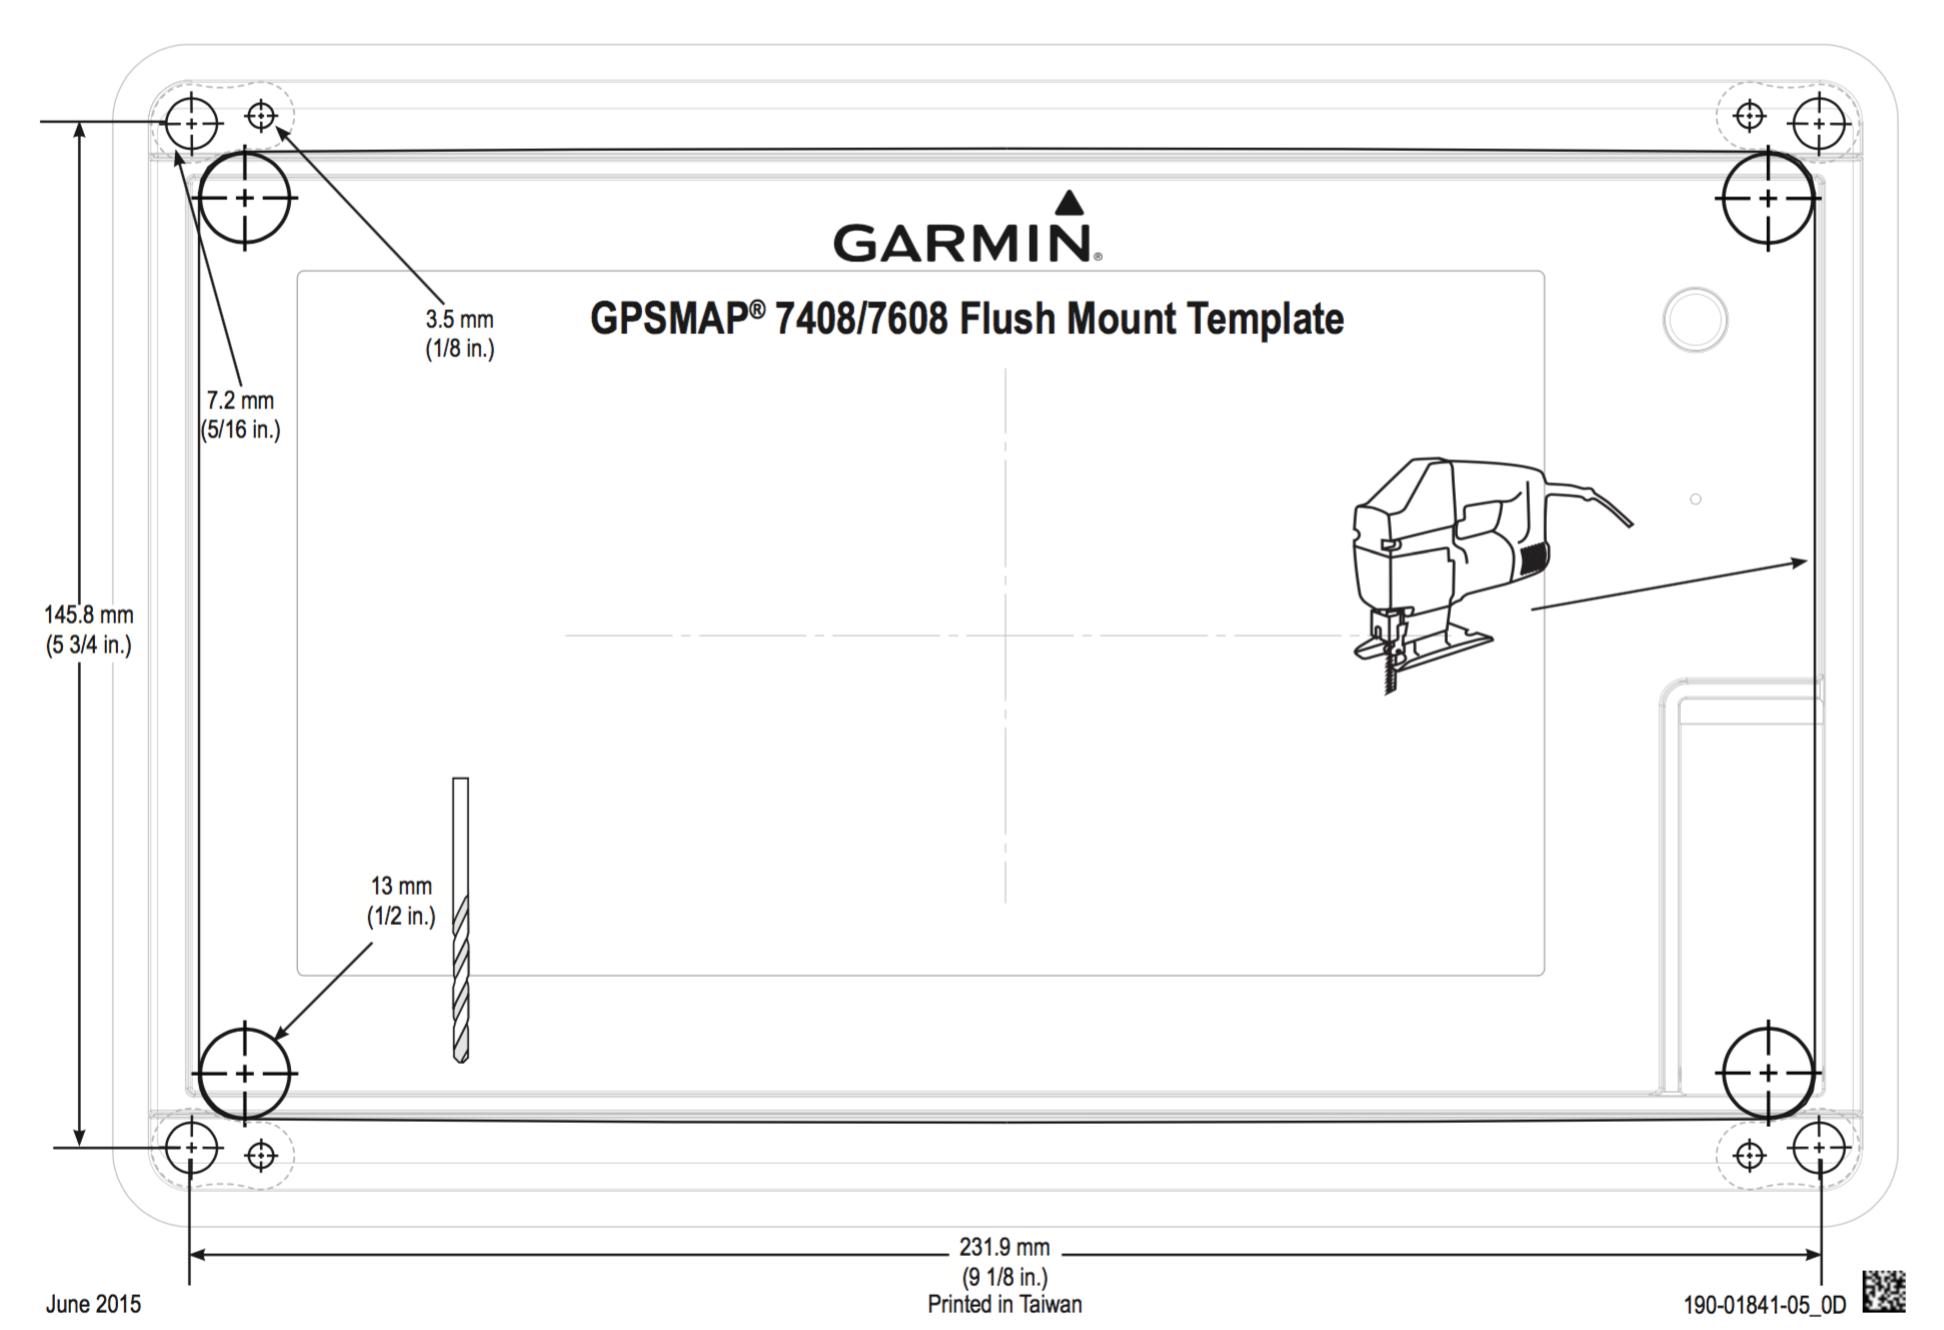 gpsmap 7408 7608 mounting template